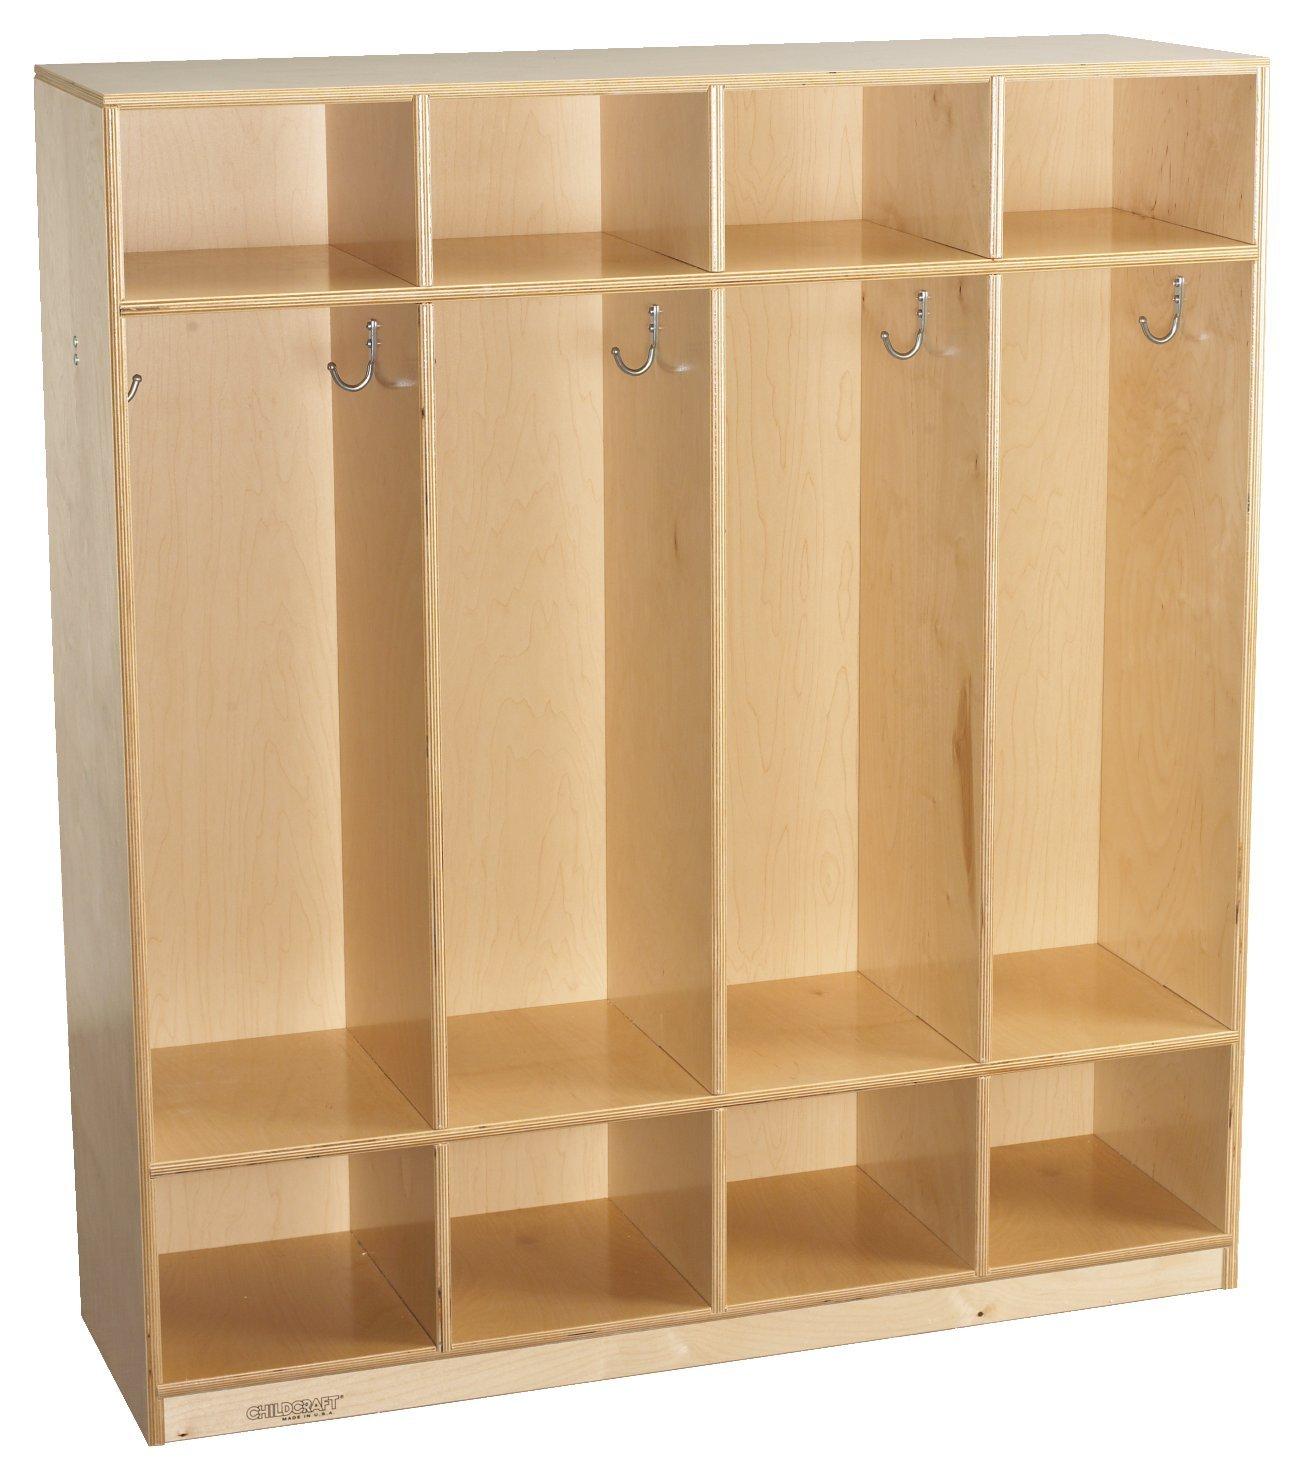 Childcraft 593592 4-Unit Coat Locker, 14.75'' Height, 35.75'' Width, 48'' Length, Natural Wood